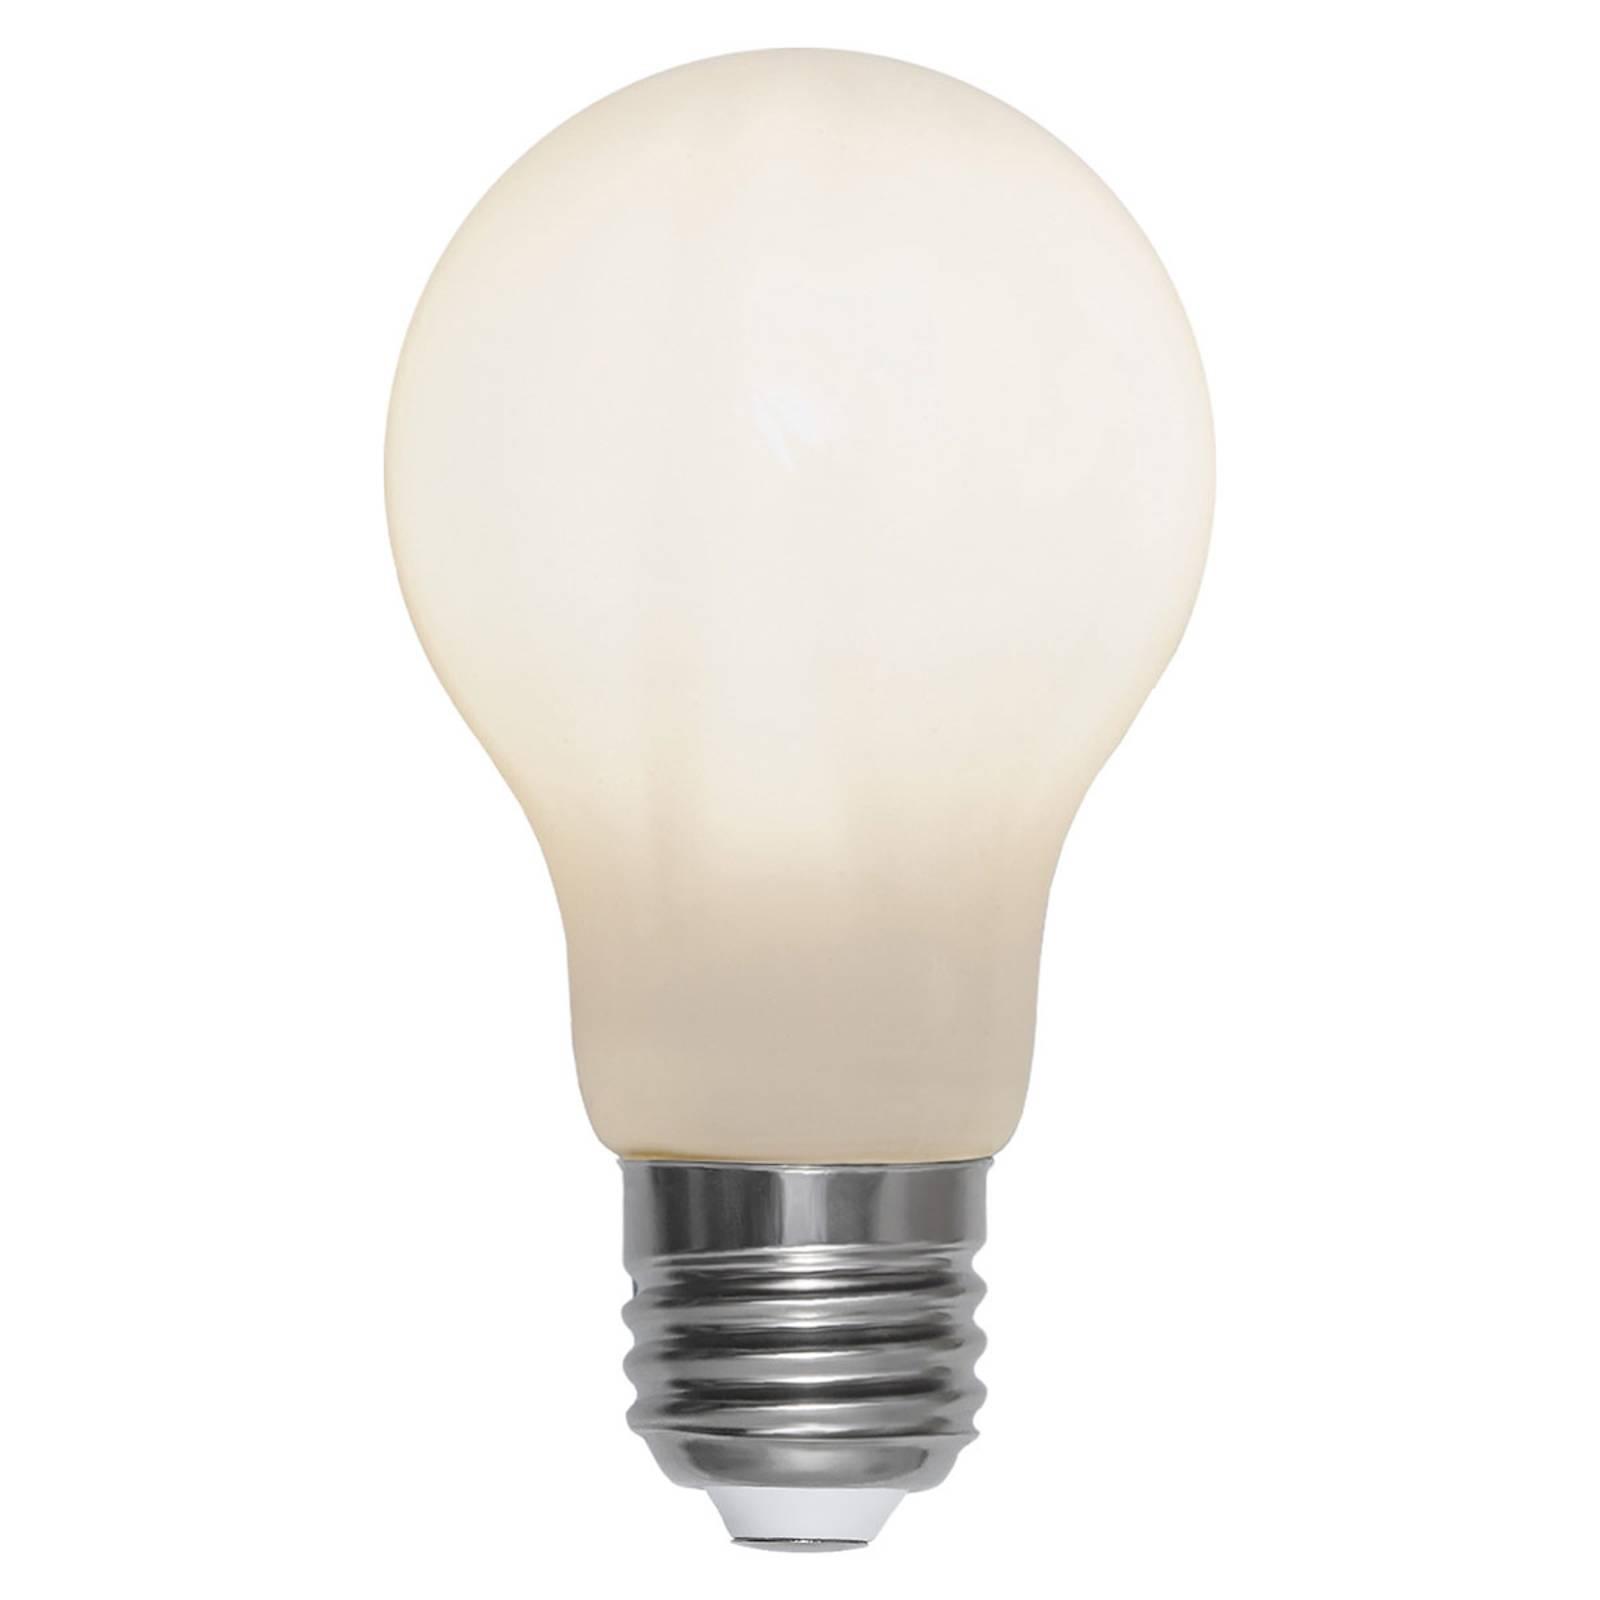 LED-lamppu E27 2 700 K Ra90 opaali 7,5W